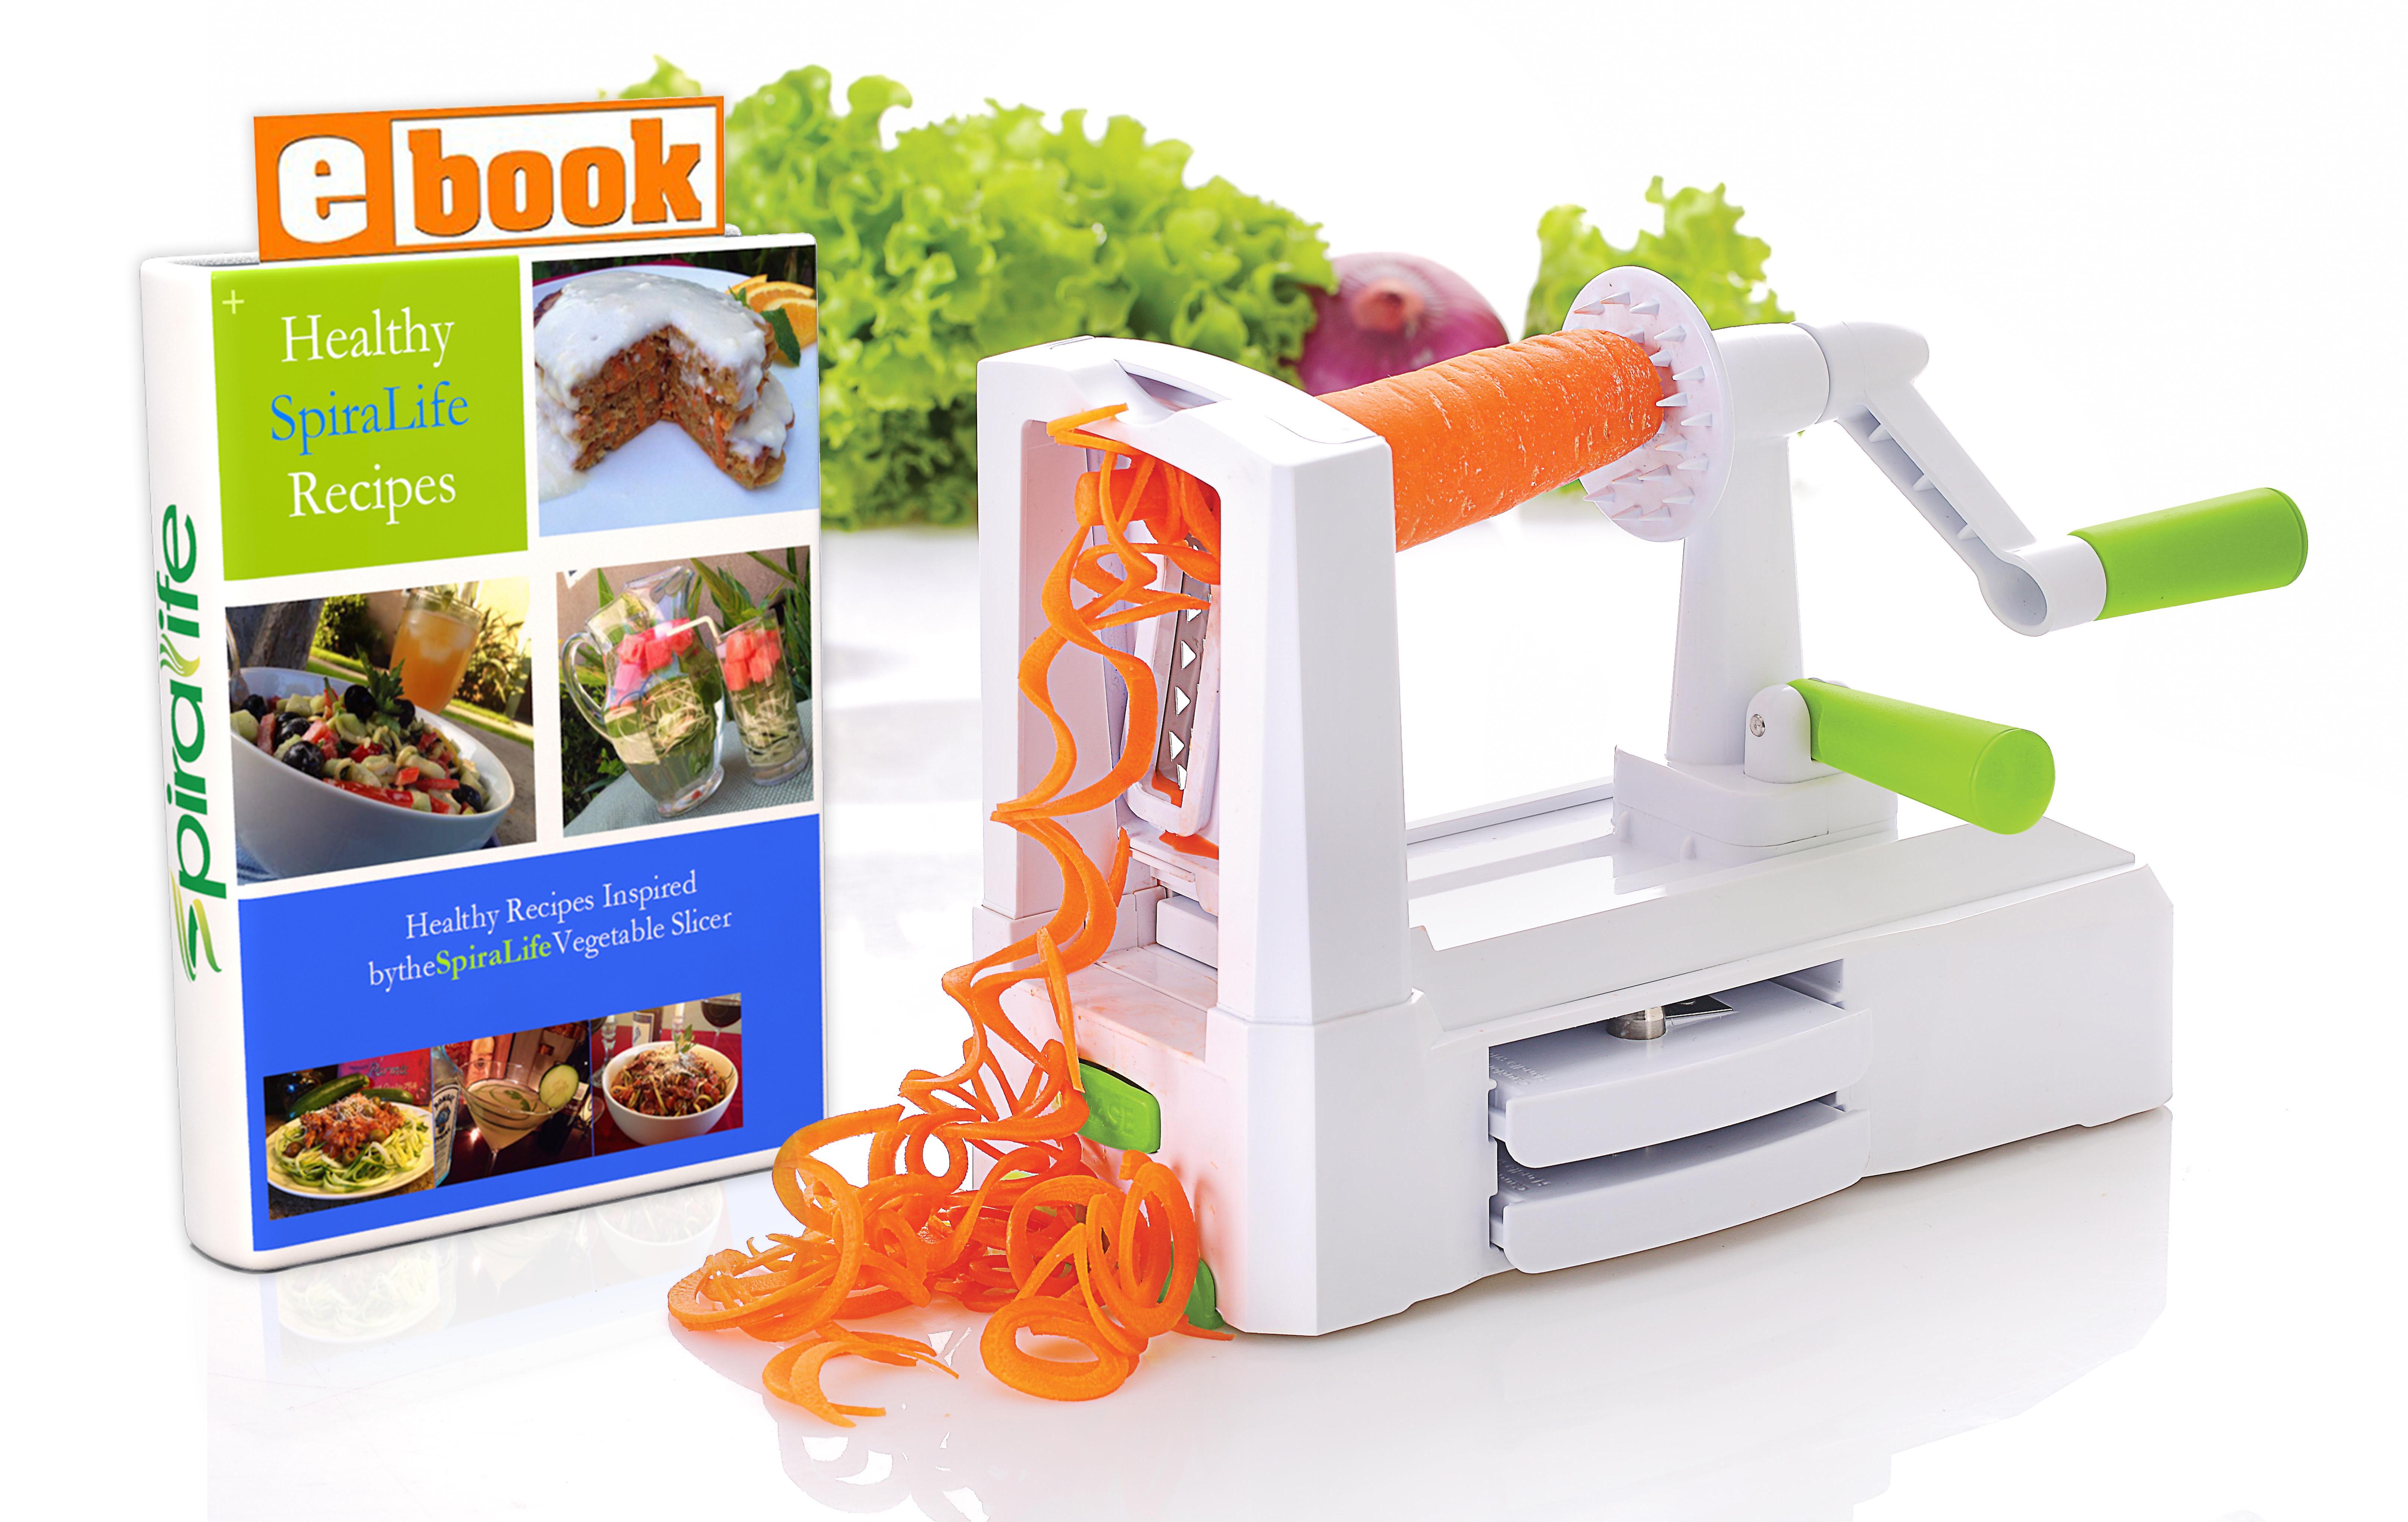 SpiraLife Pro Vegetable Spiralizer